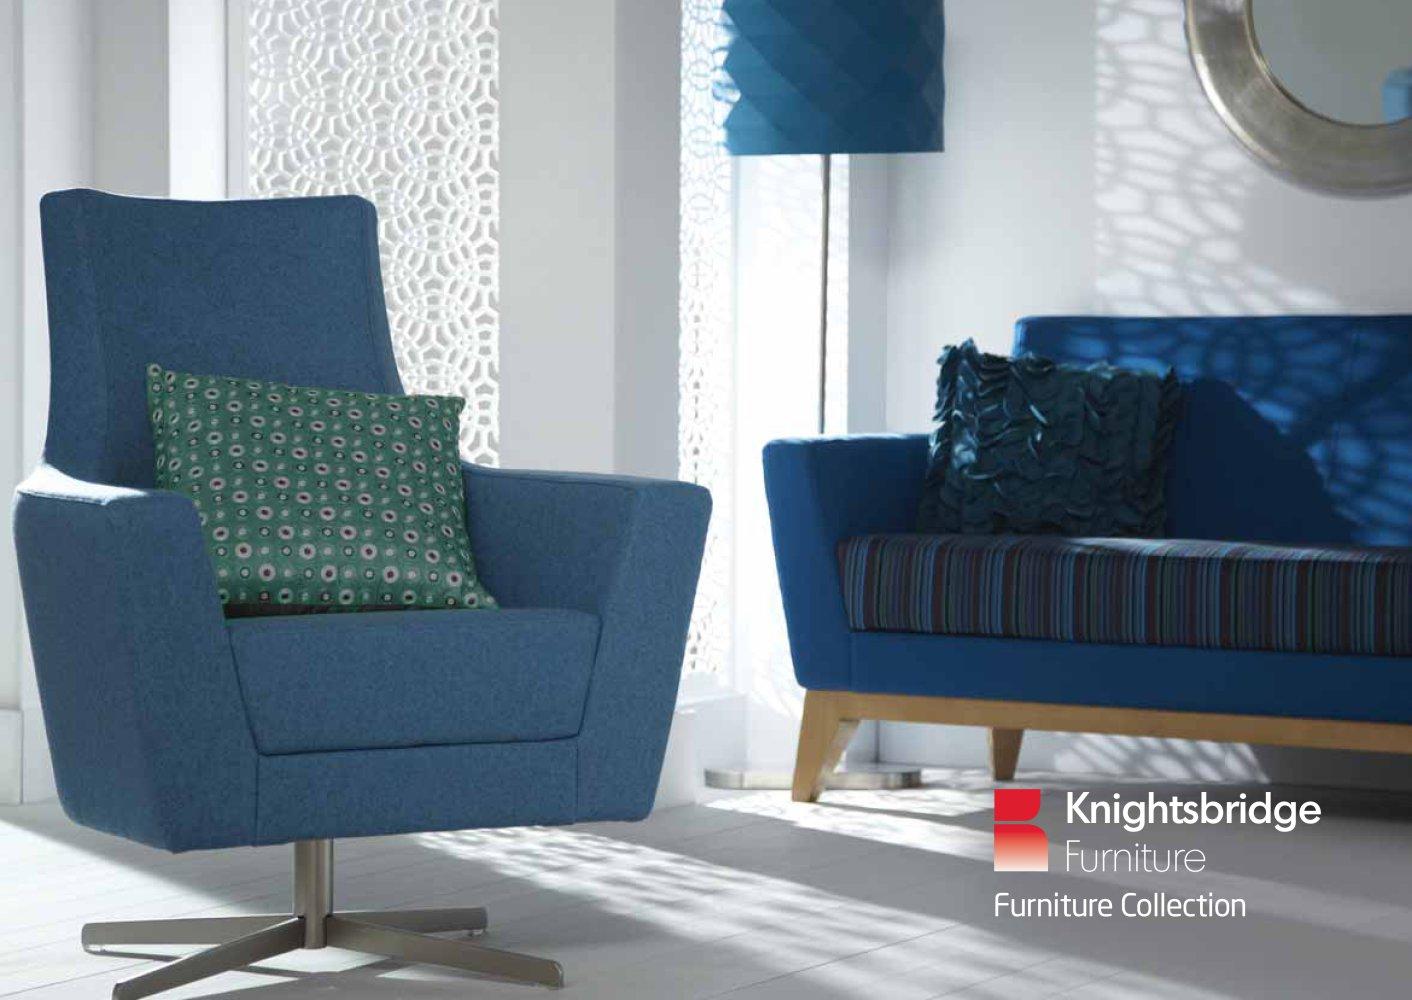 KFP Furniture Collection Brochure 2016 - Knightsbridge Furniture ...